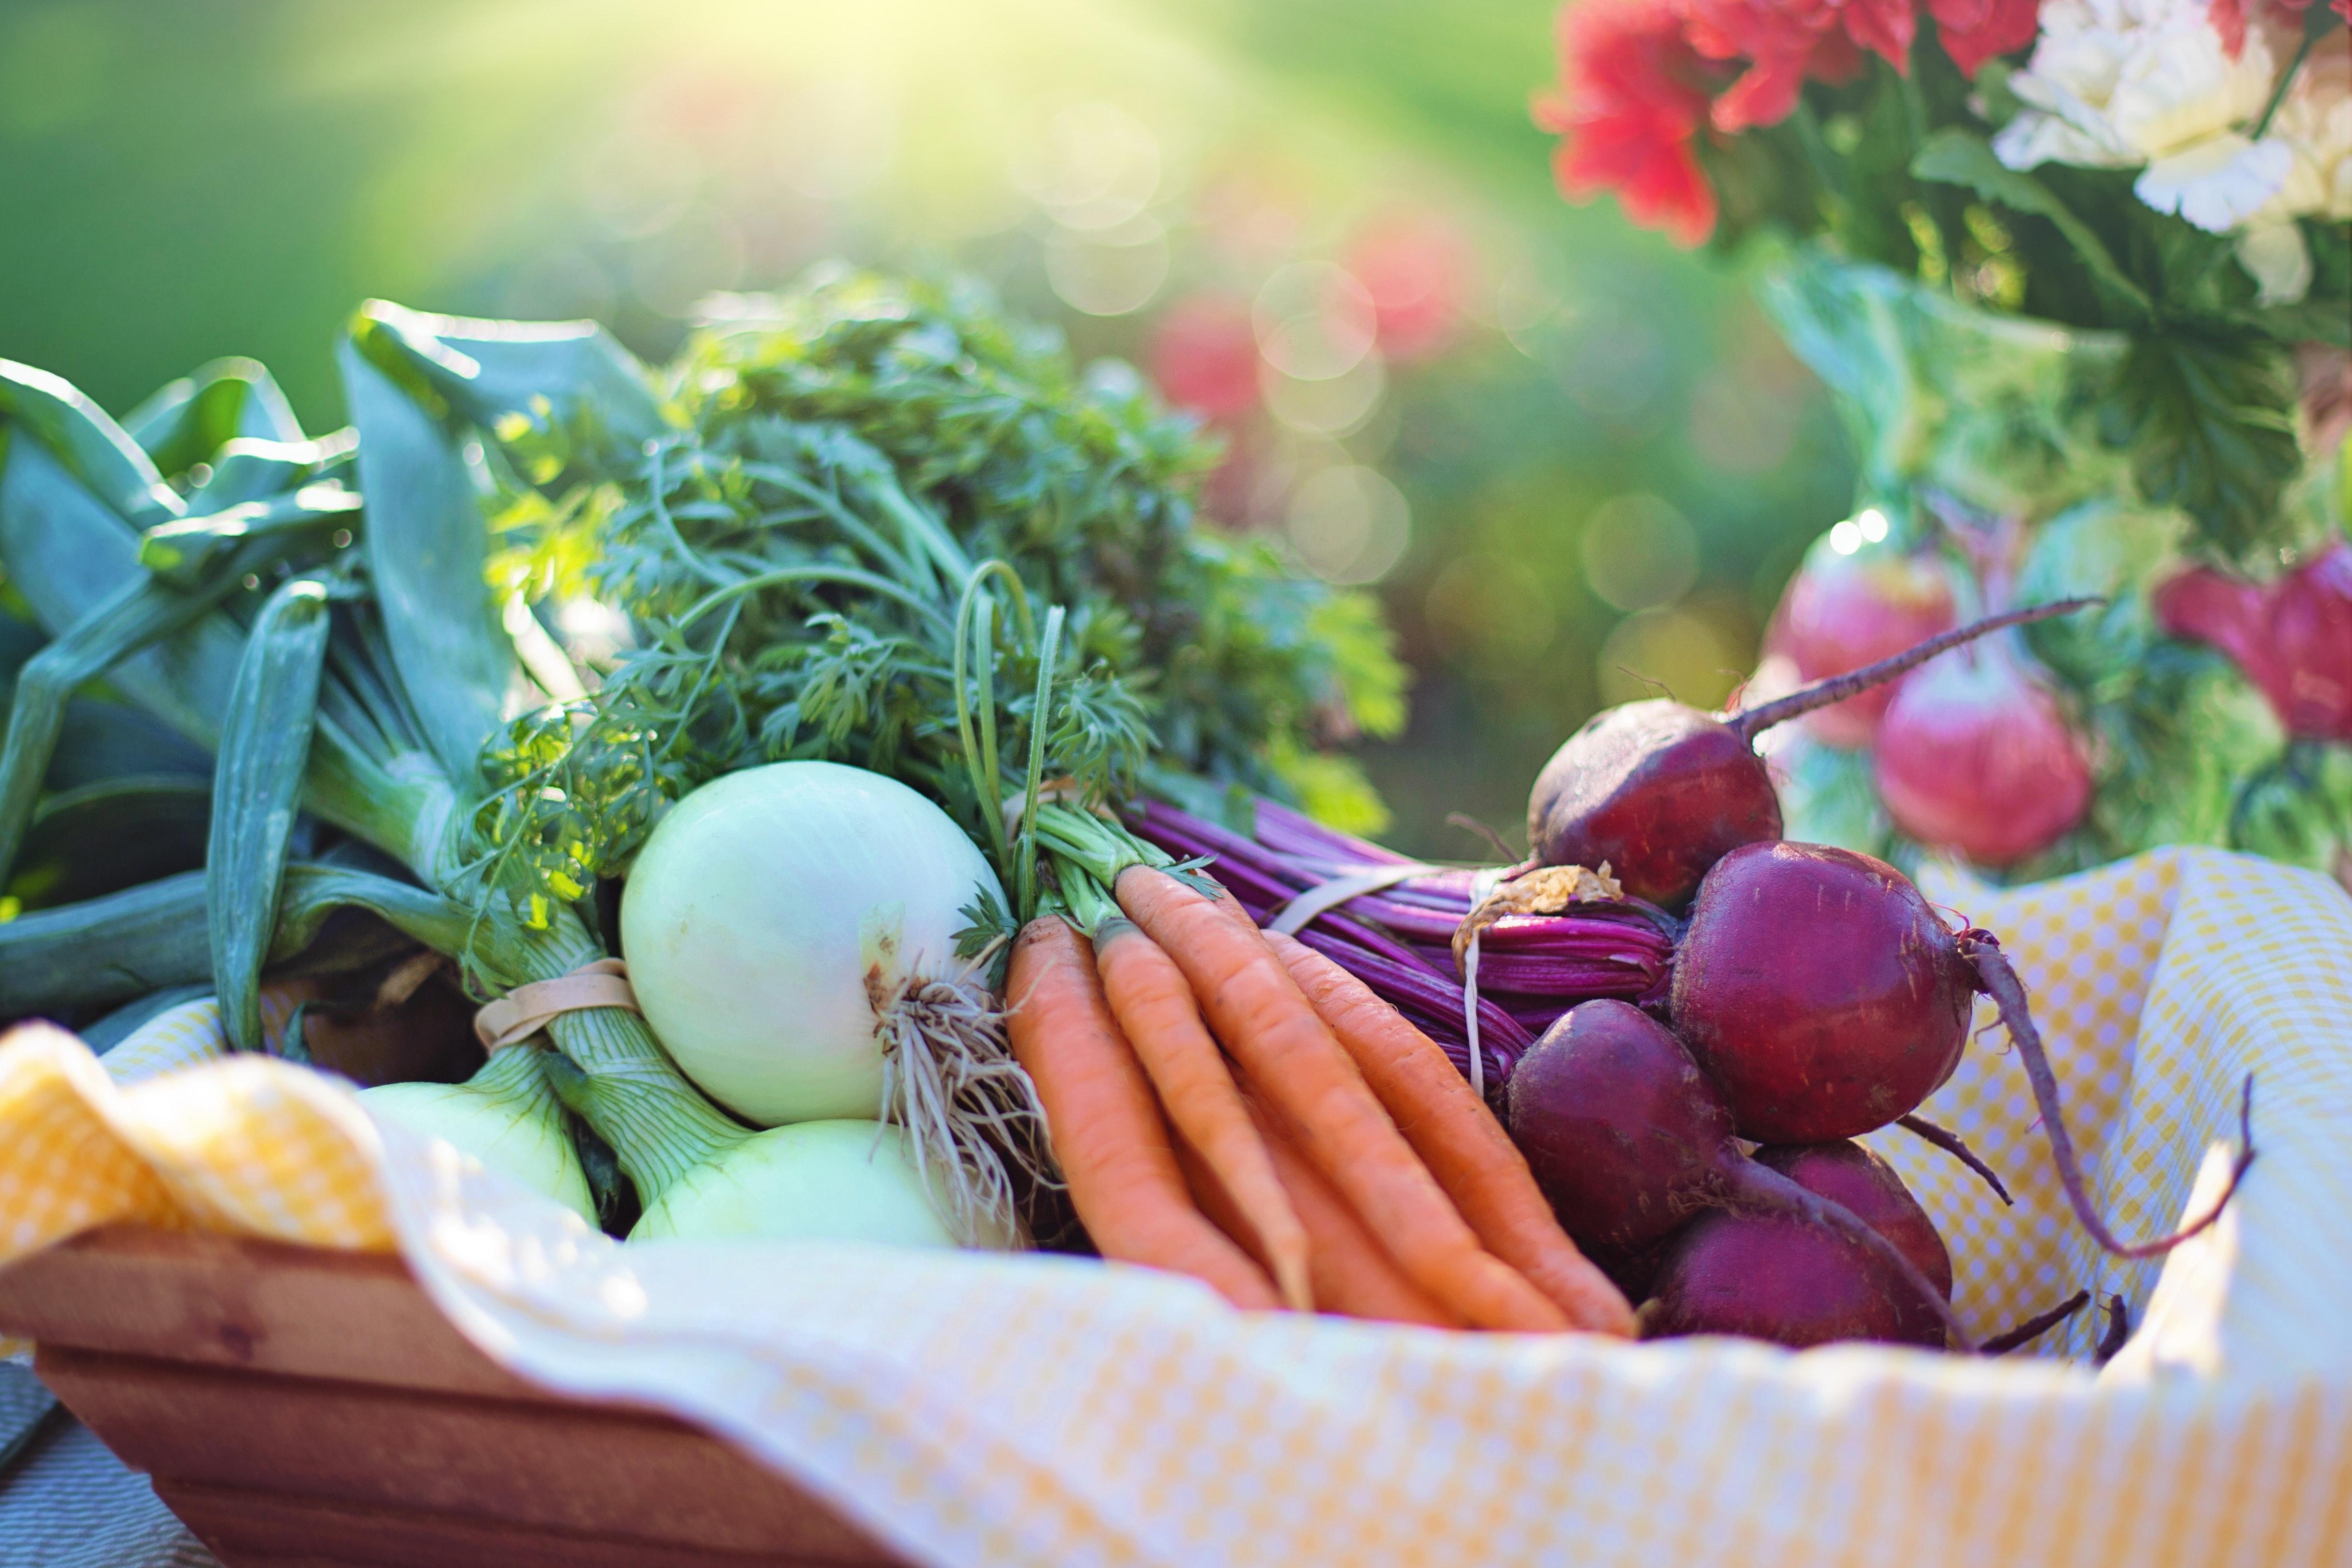 Basket full of colourful vegetables